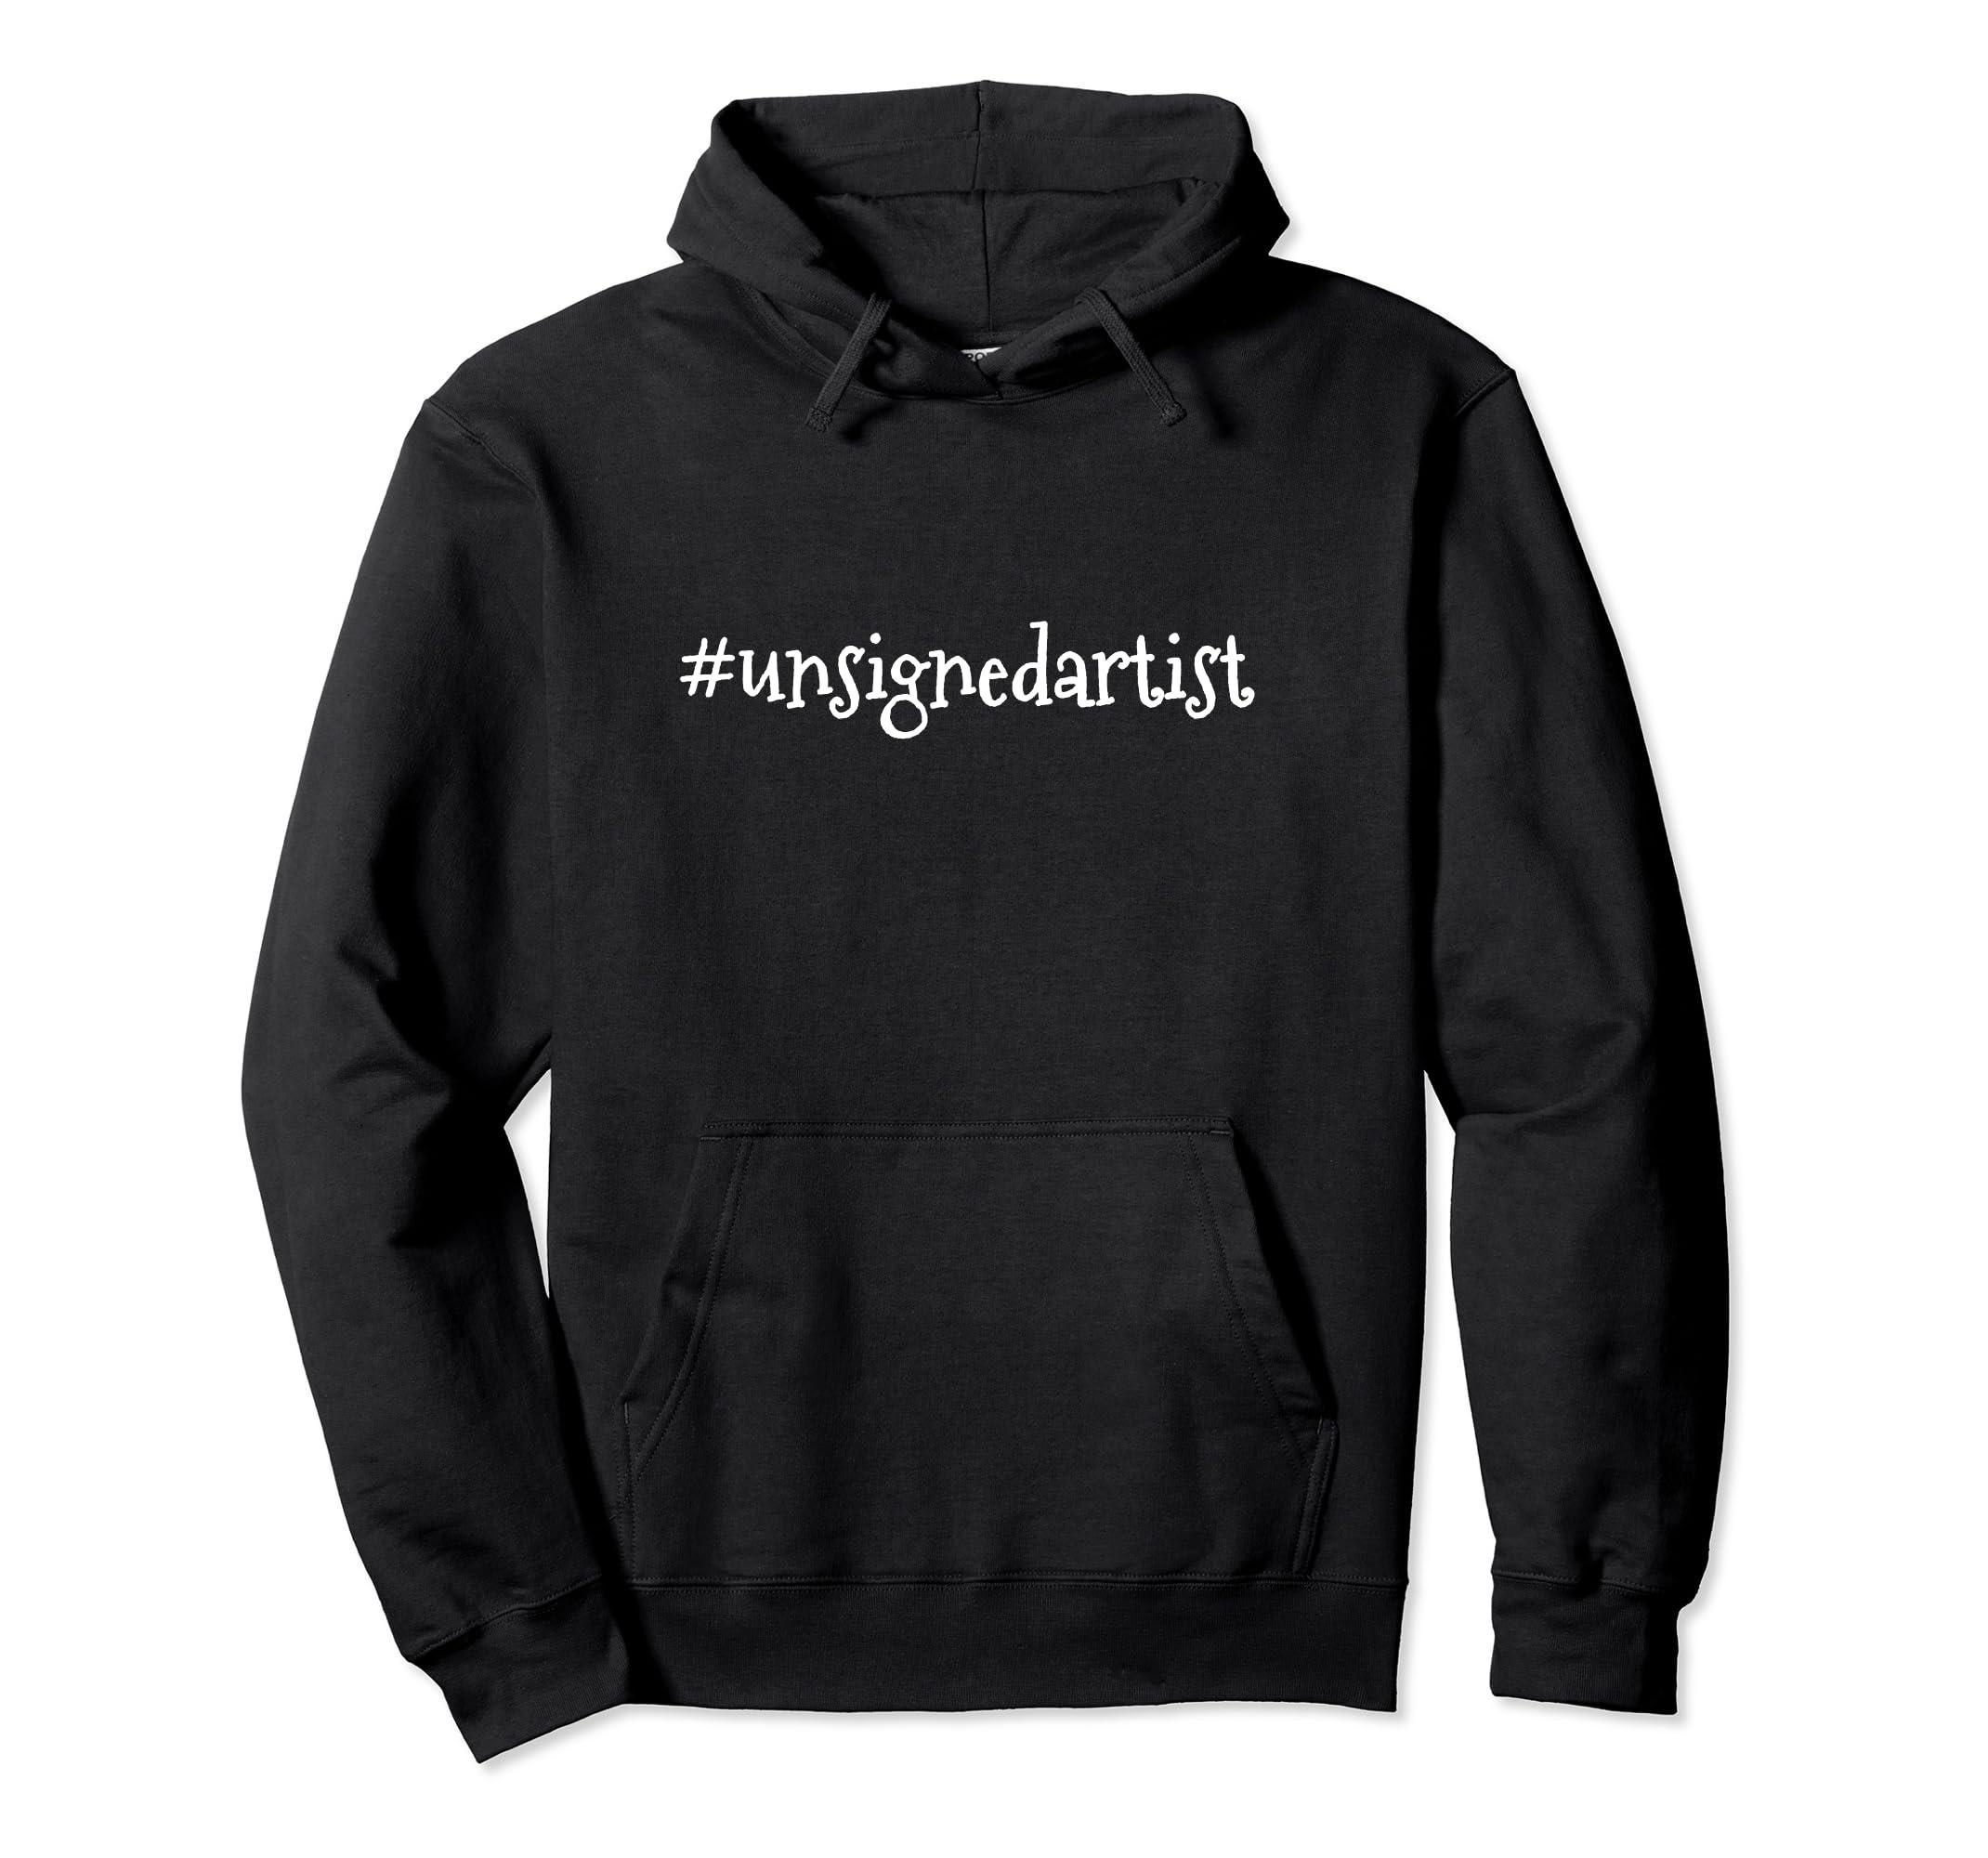 #Unsignedartist Pullover Hoodie